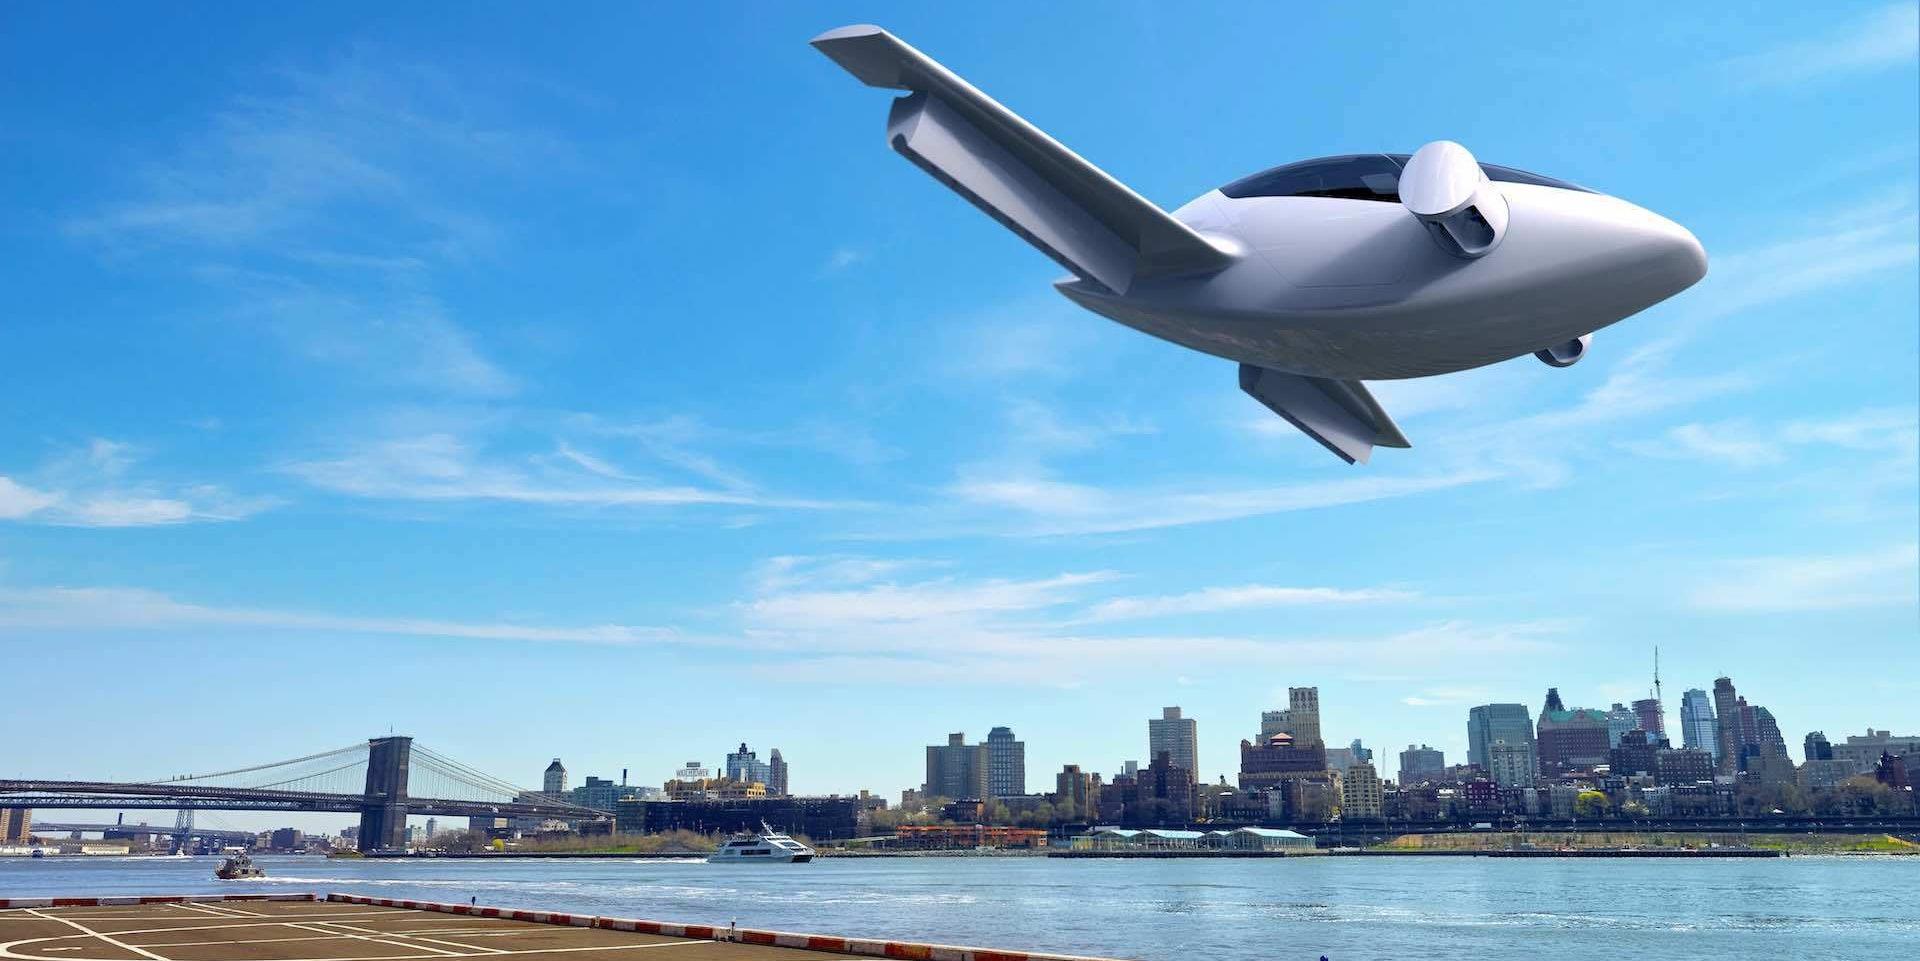 lilium aviation takeoff